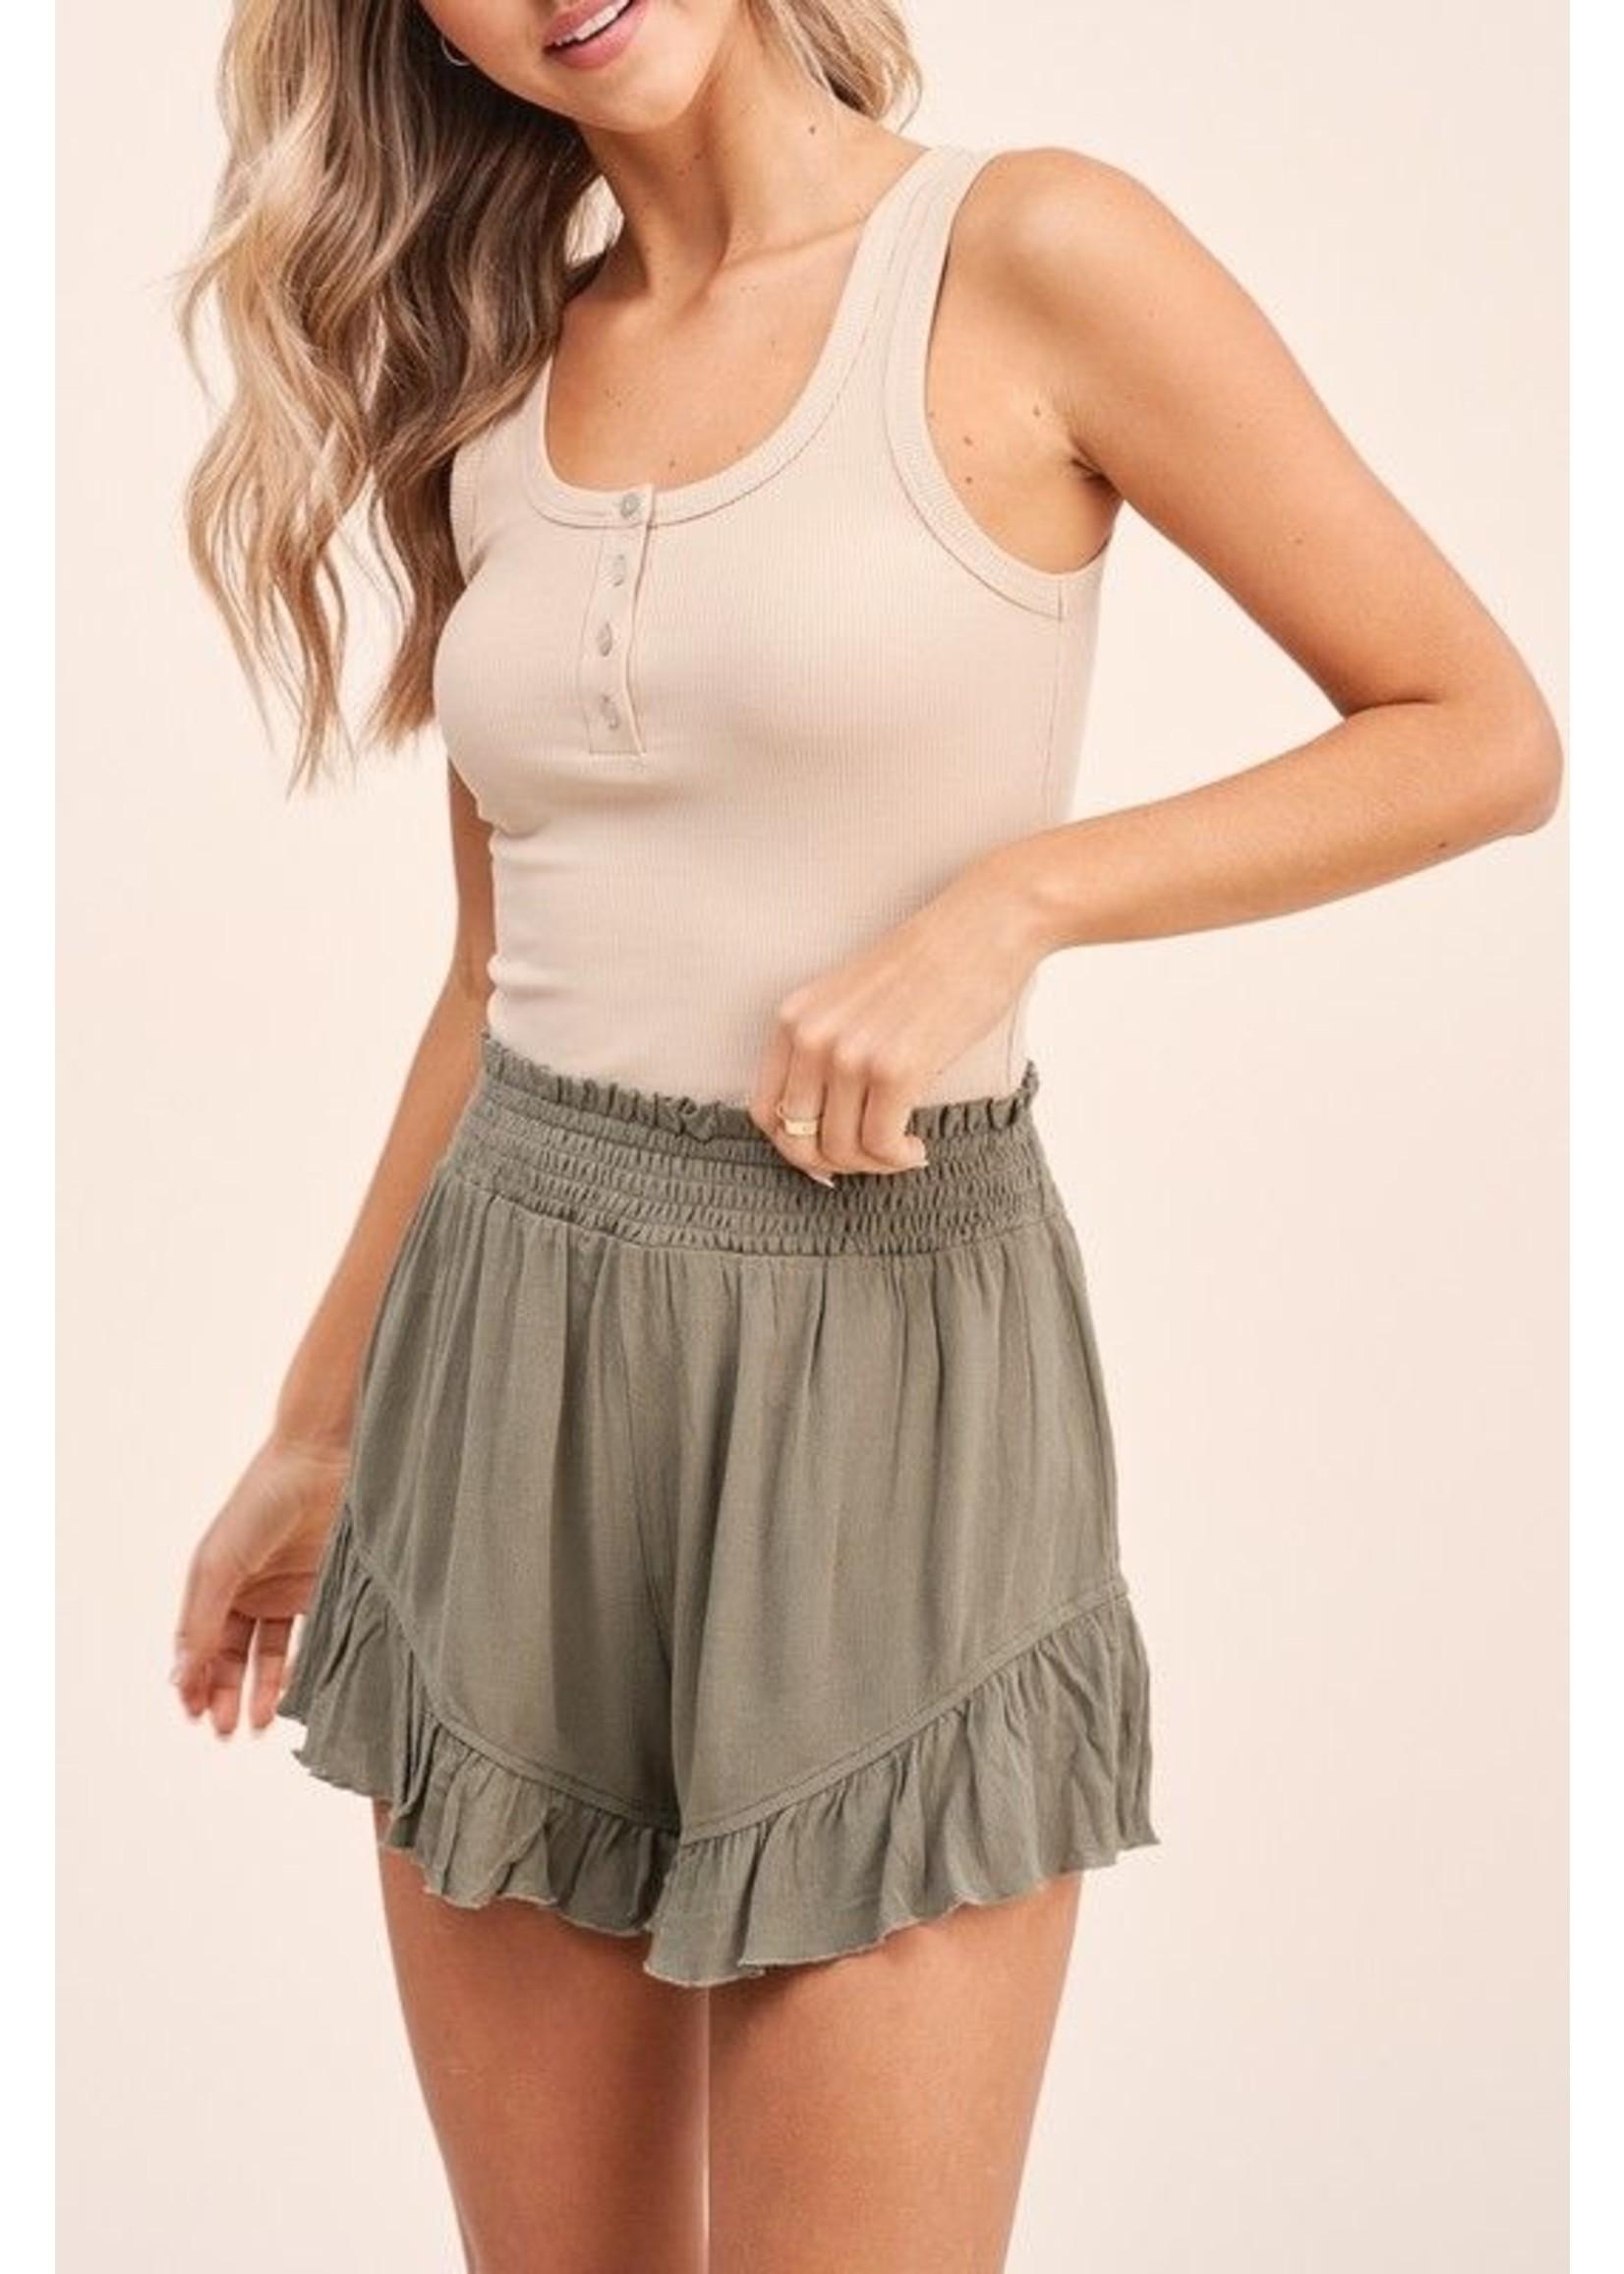 LA MIEL Kaylee Shorts Olive